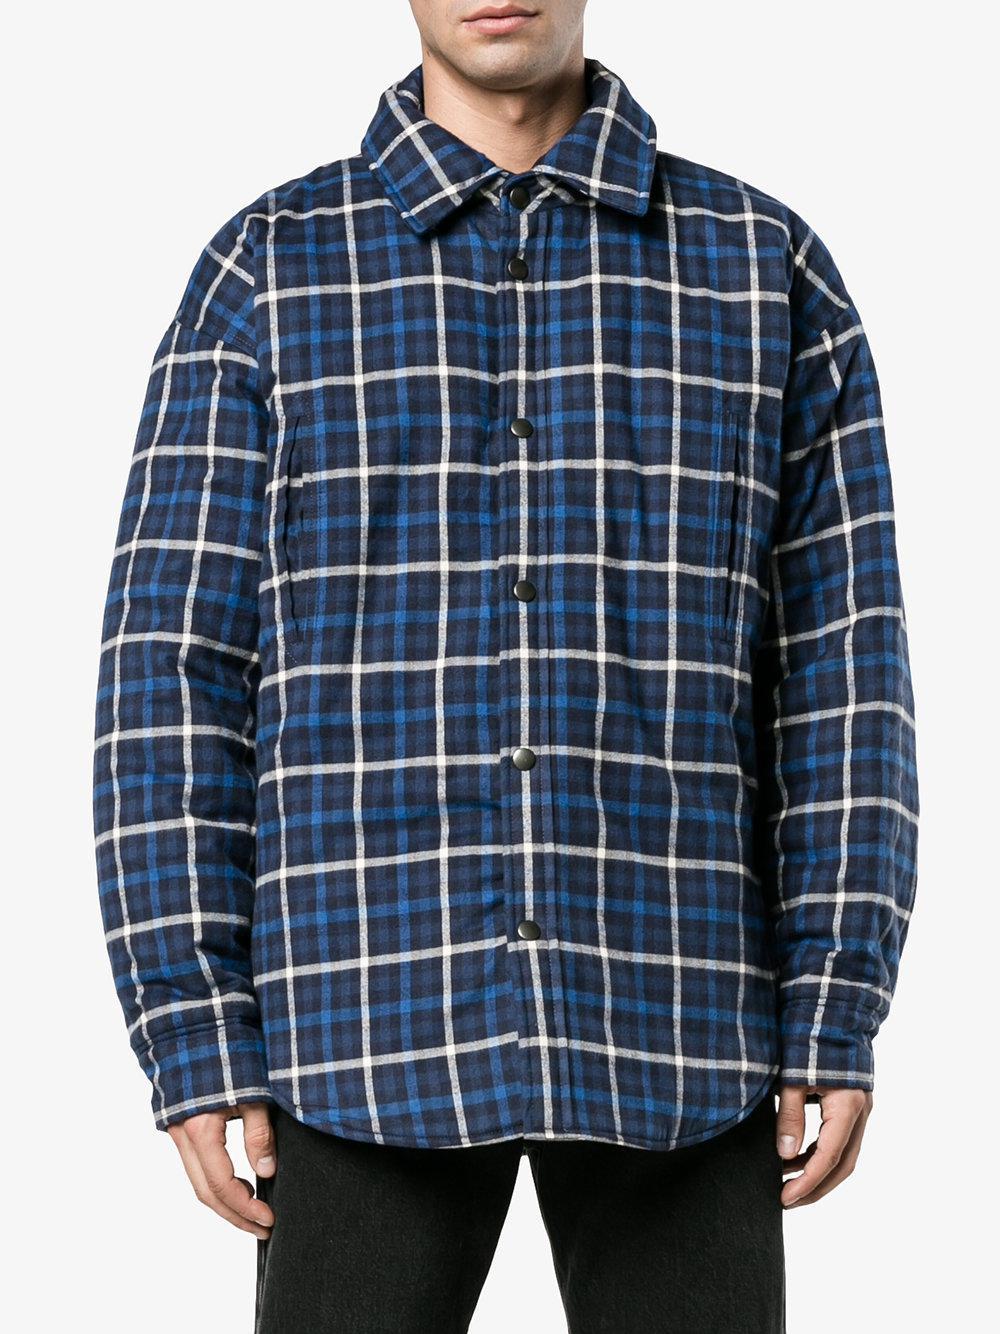 86a037886c5 This ridiculous Balenciaga shirt will set you back  1